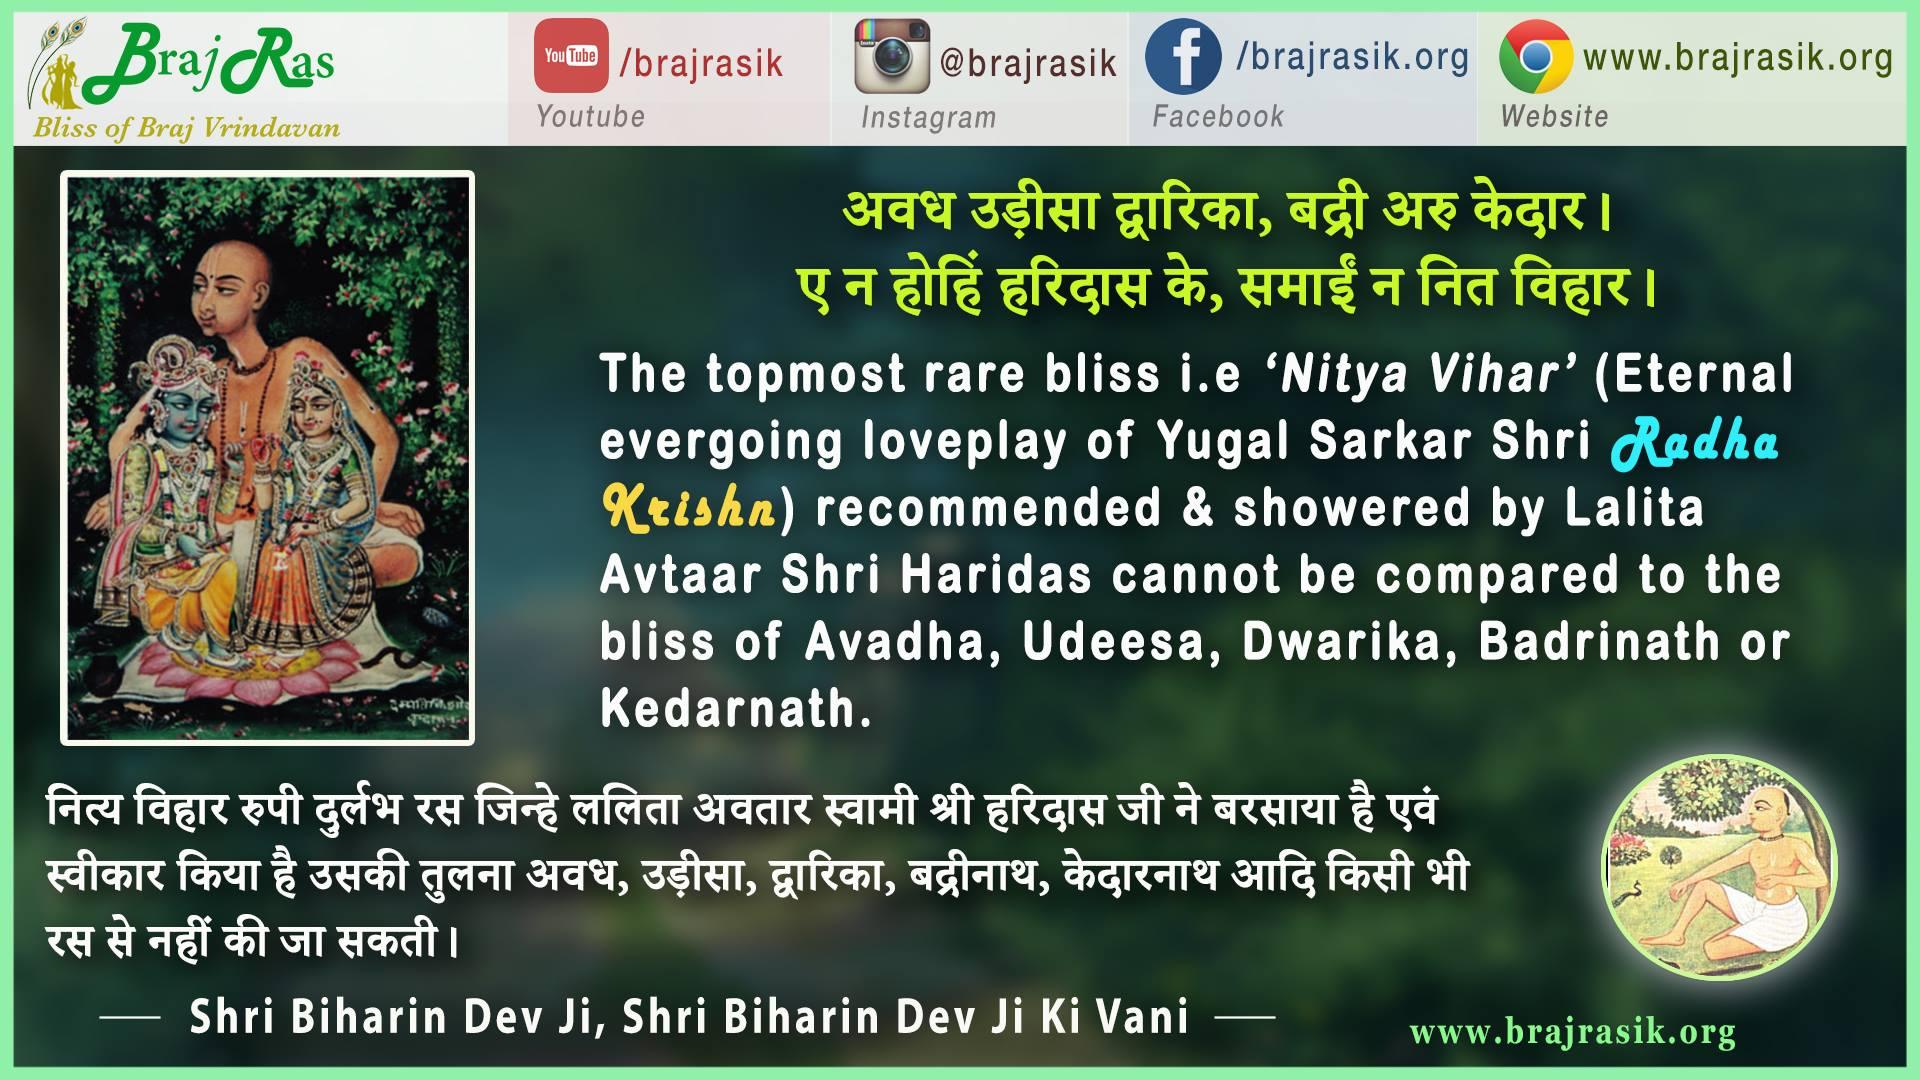 Avadha Udeesa Dwarika, Badri Aru Kedaar - Shri Biharin Dev Ji, Shri Biharin Dev Ji Ki Vani